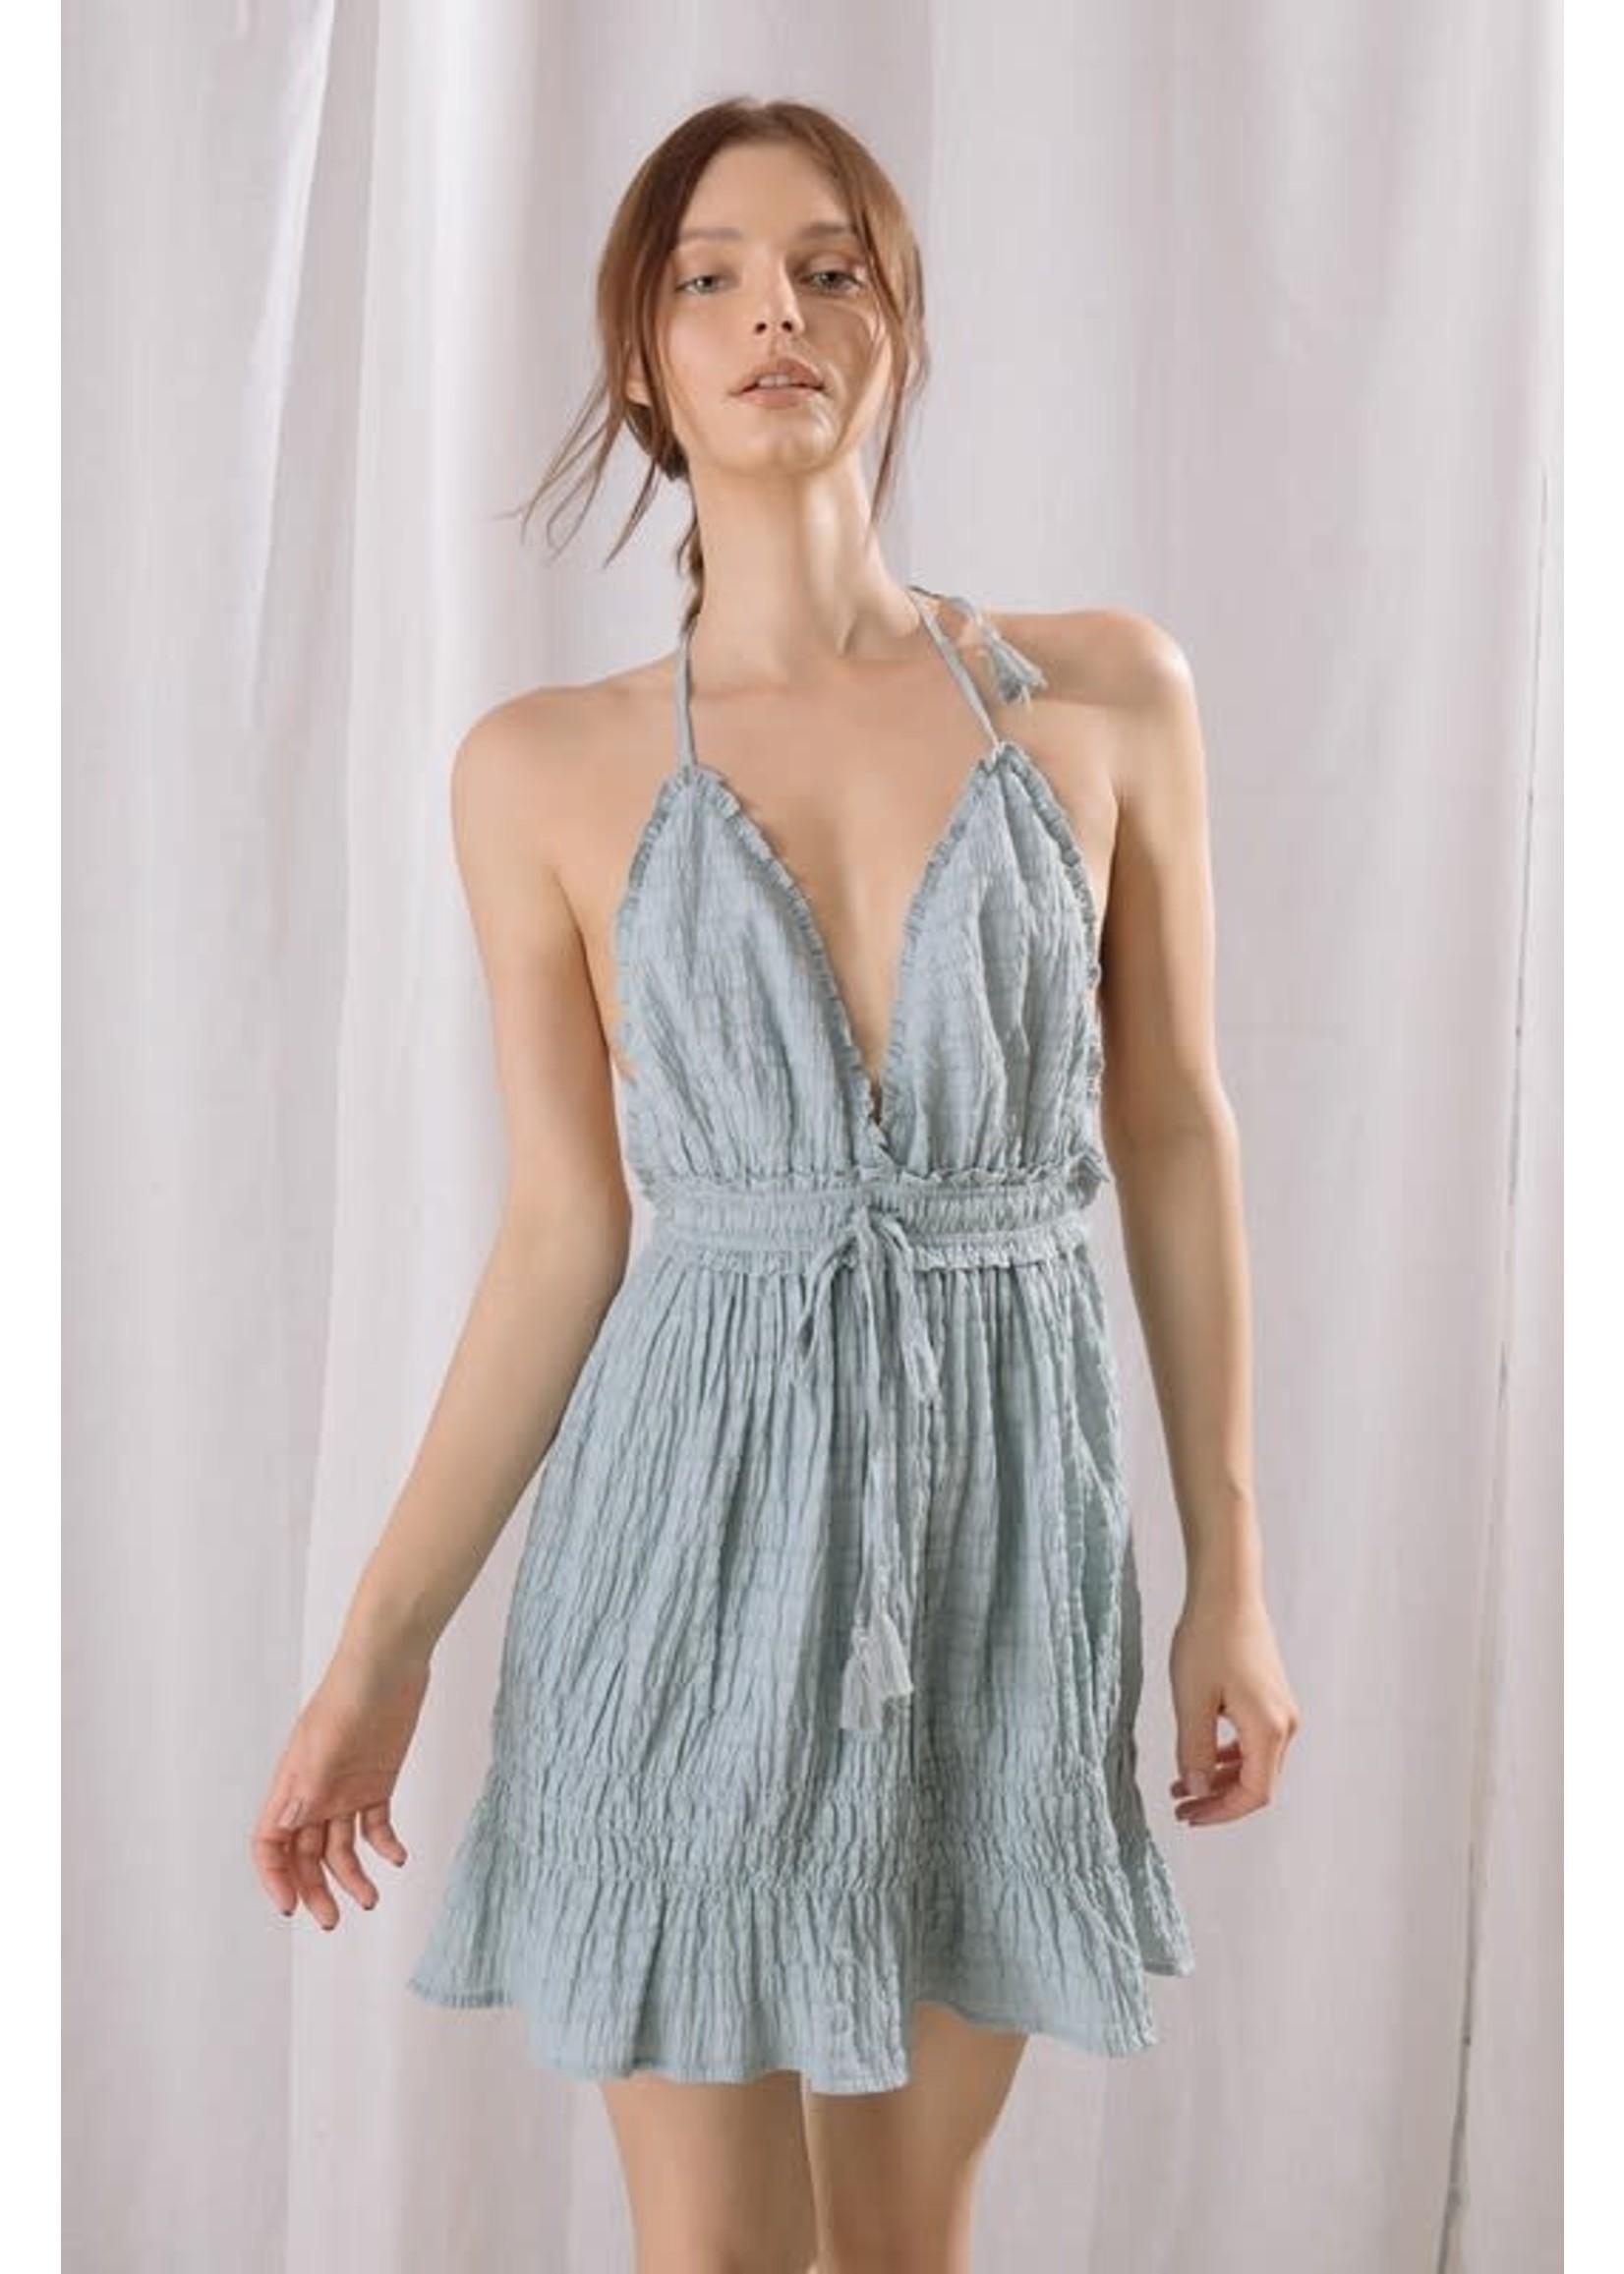 Storia Monochromatic Low Back Mini Dress - BD1924